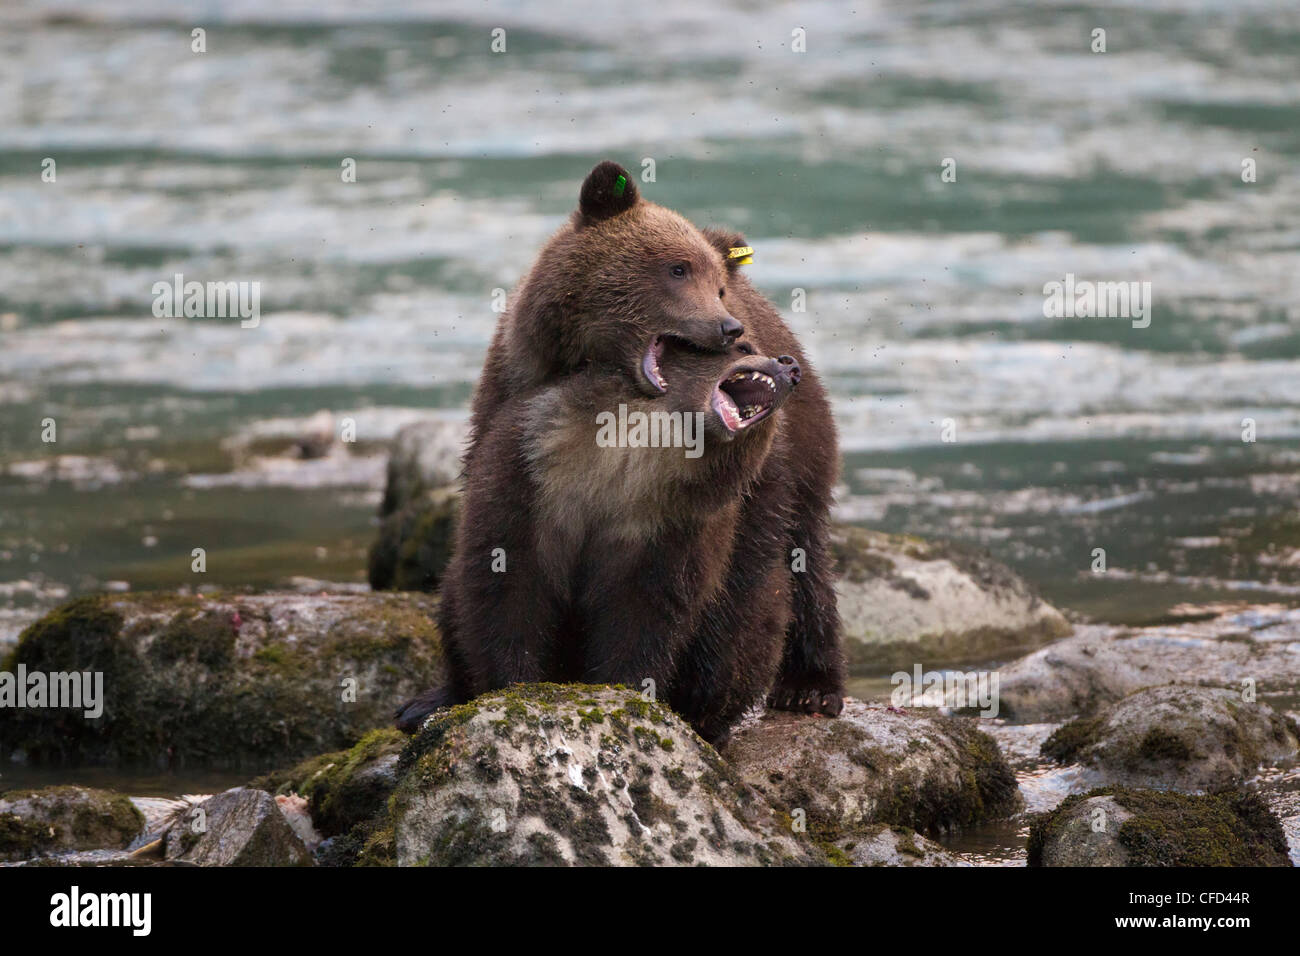 Orso grizzly (Ursus arctos horribilis), cubs, giocare wrestling, Chilkoot River, Haines, Alaska, Stati Uniti d'America Immagini Stock